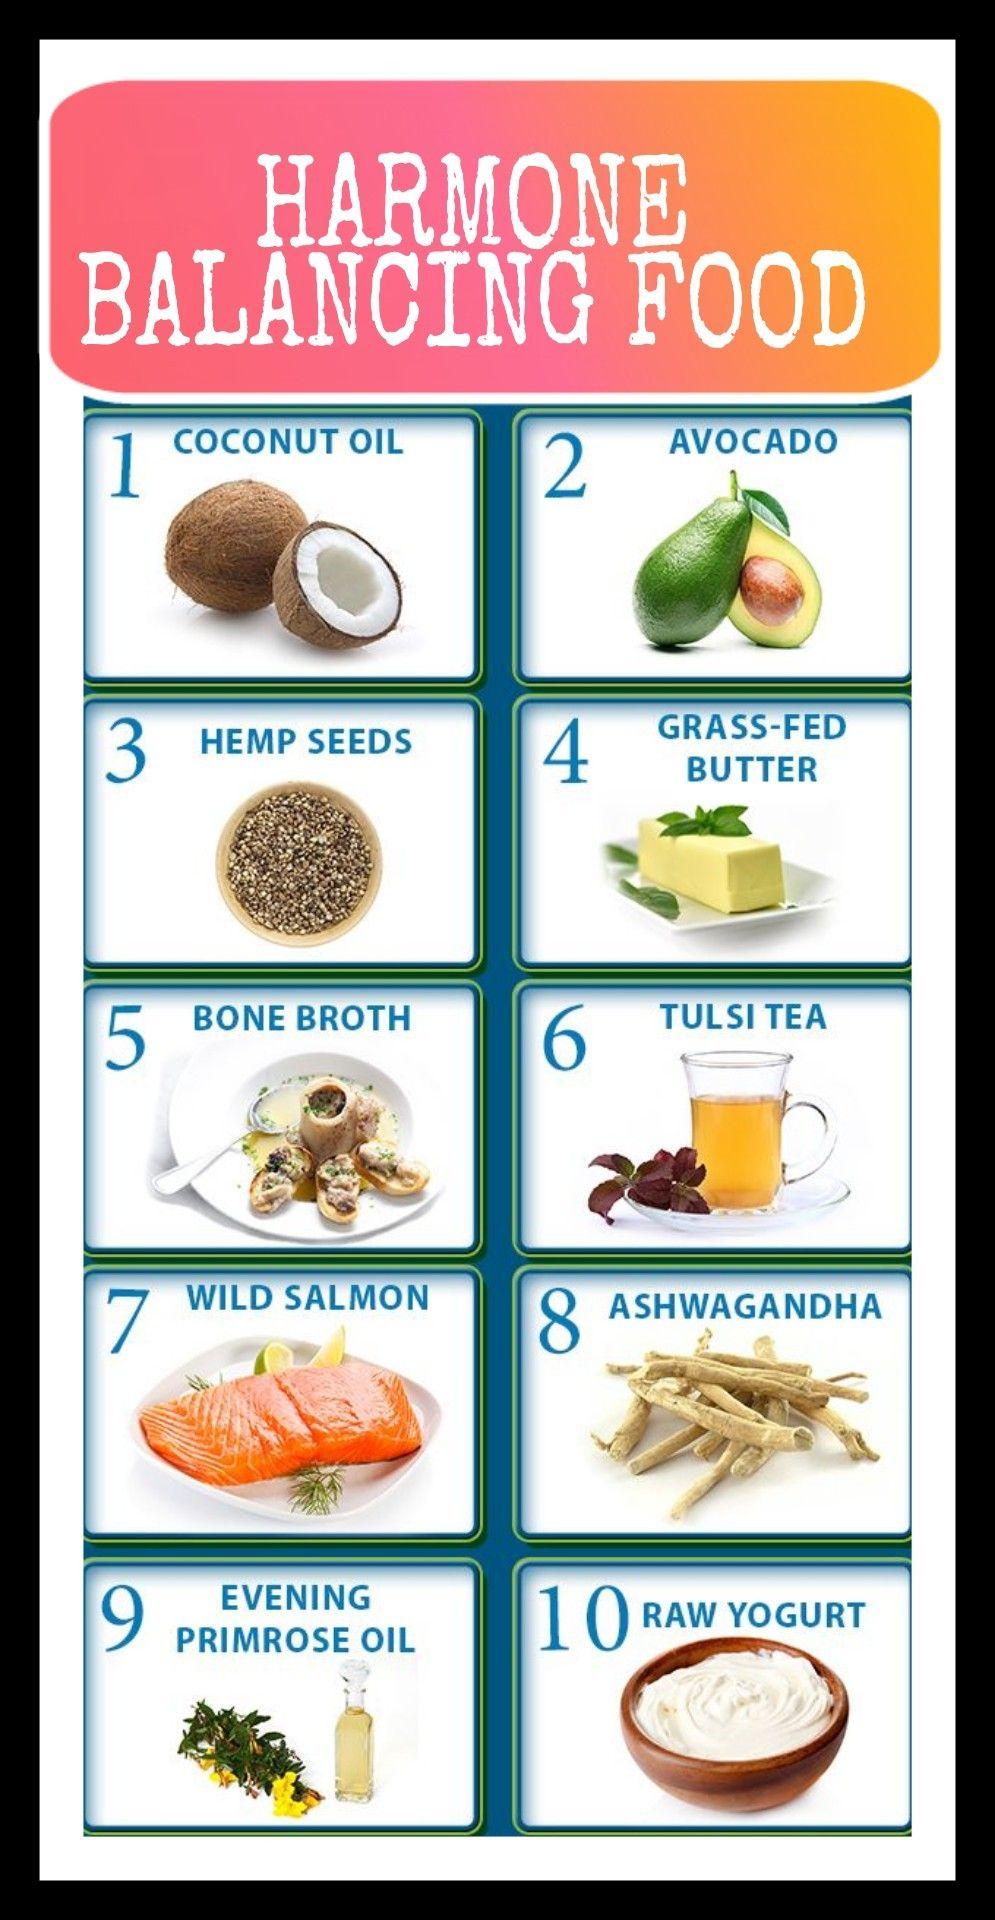 Harmone balancing foods foods to balance hormones